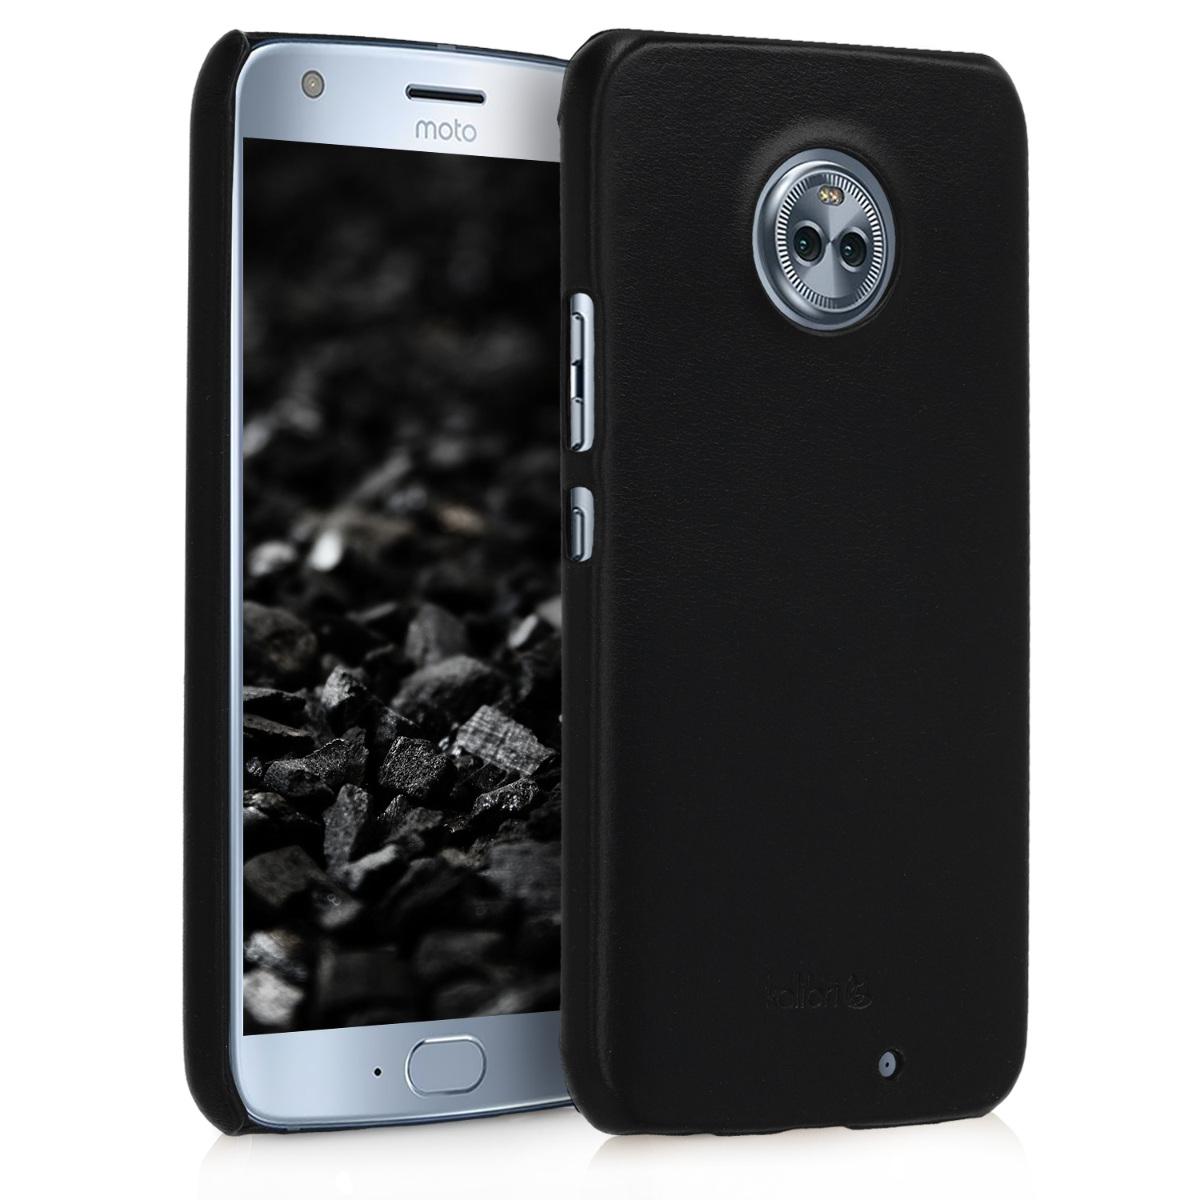 Kalibri Σκληρή Δερμάτινη Θήκη Motorola Moto X4 - Μαύρο (44903.01)